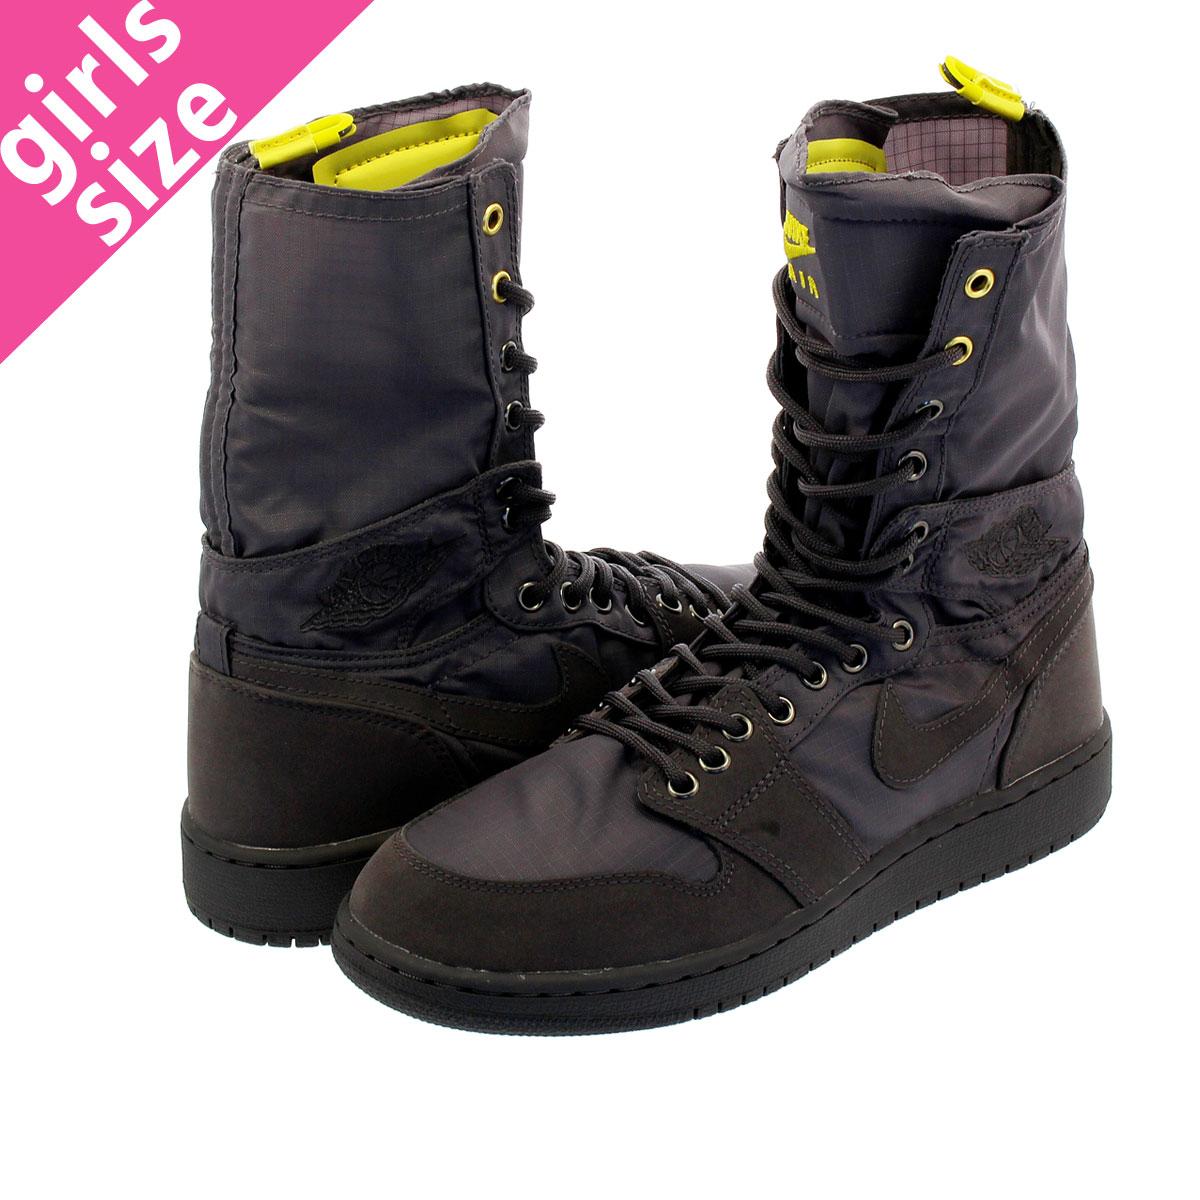 086dbd5fc81 NIKE WMNS JORDAN 1 EXPLORER XX Nike women Air Jordan 1 Explorer XX THUNDE  GREY/BLIGHT CITRON